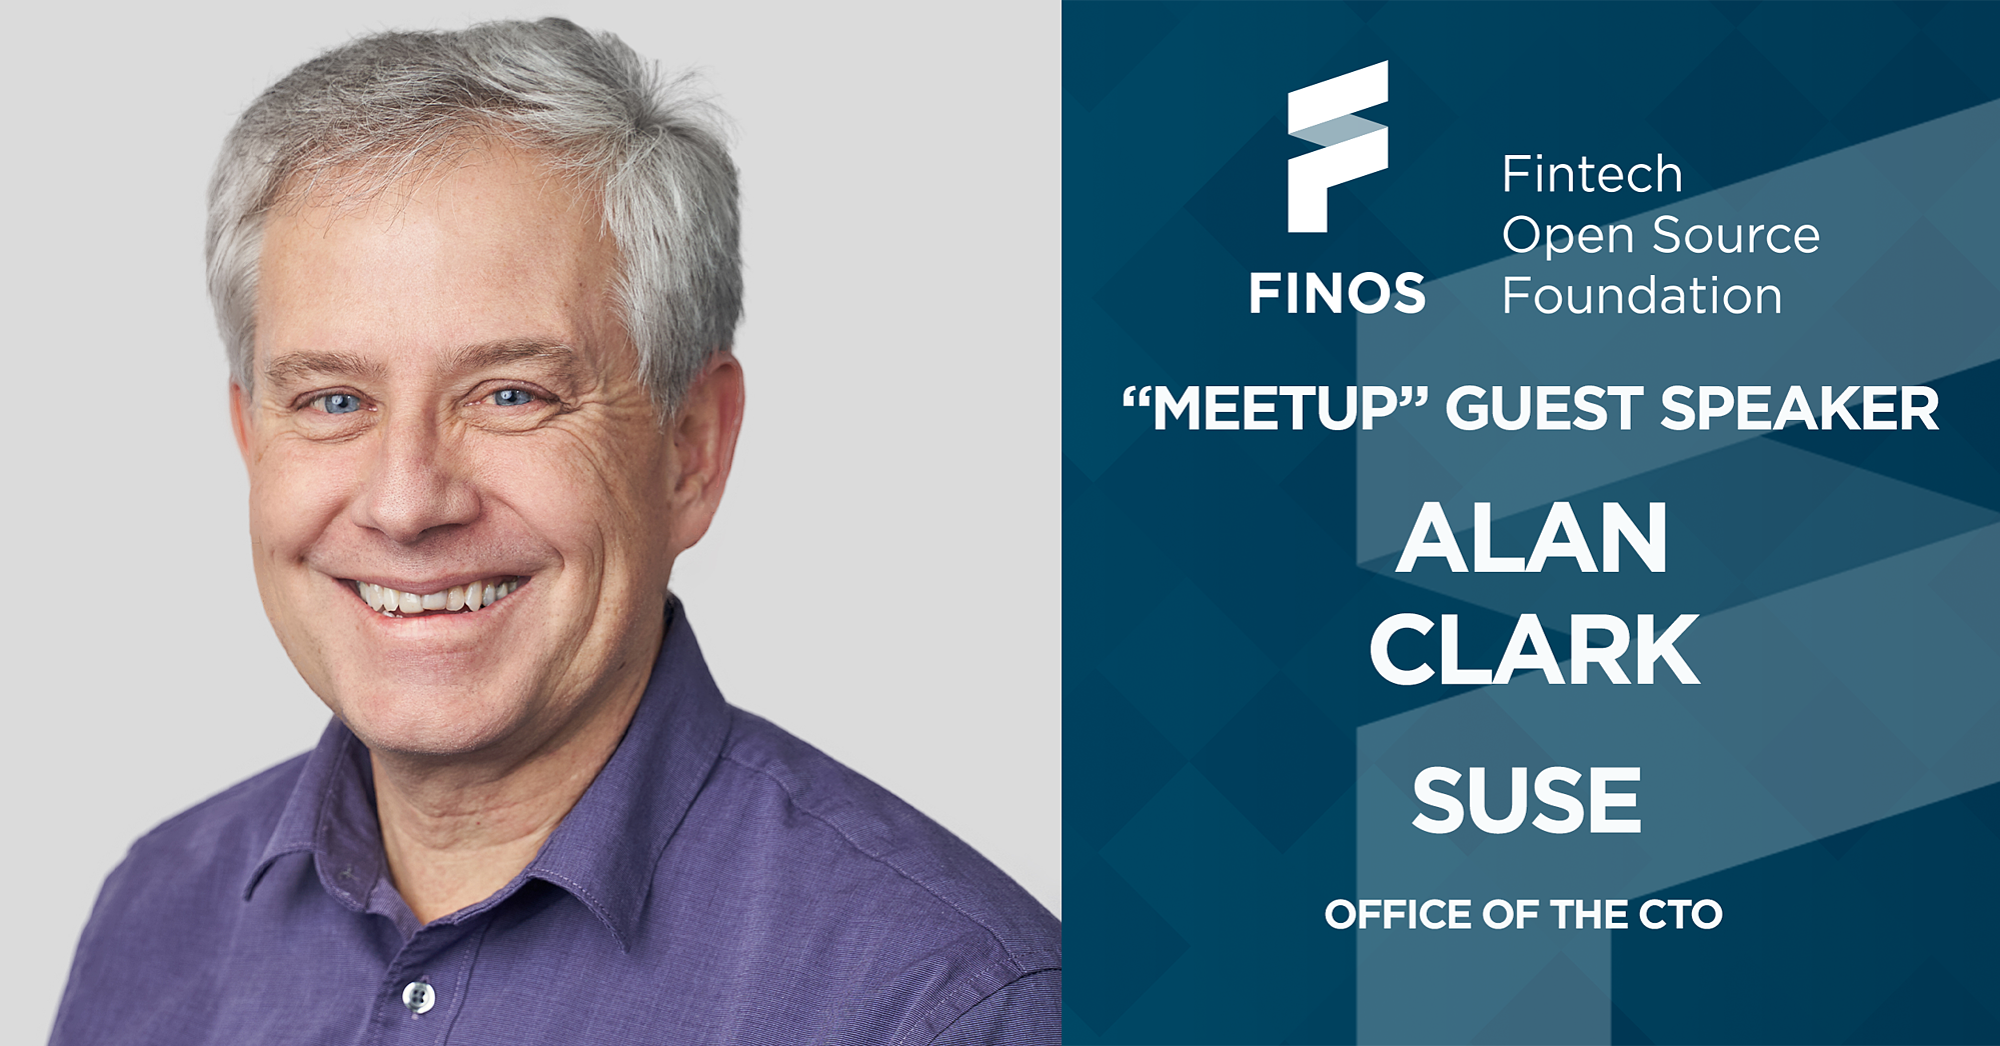 www.finos.orghubfsFINOS-MEETUP-guest-speakers-alan-clark